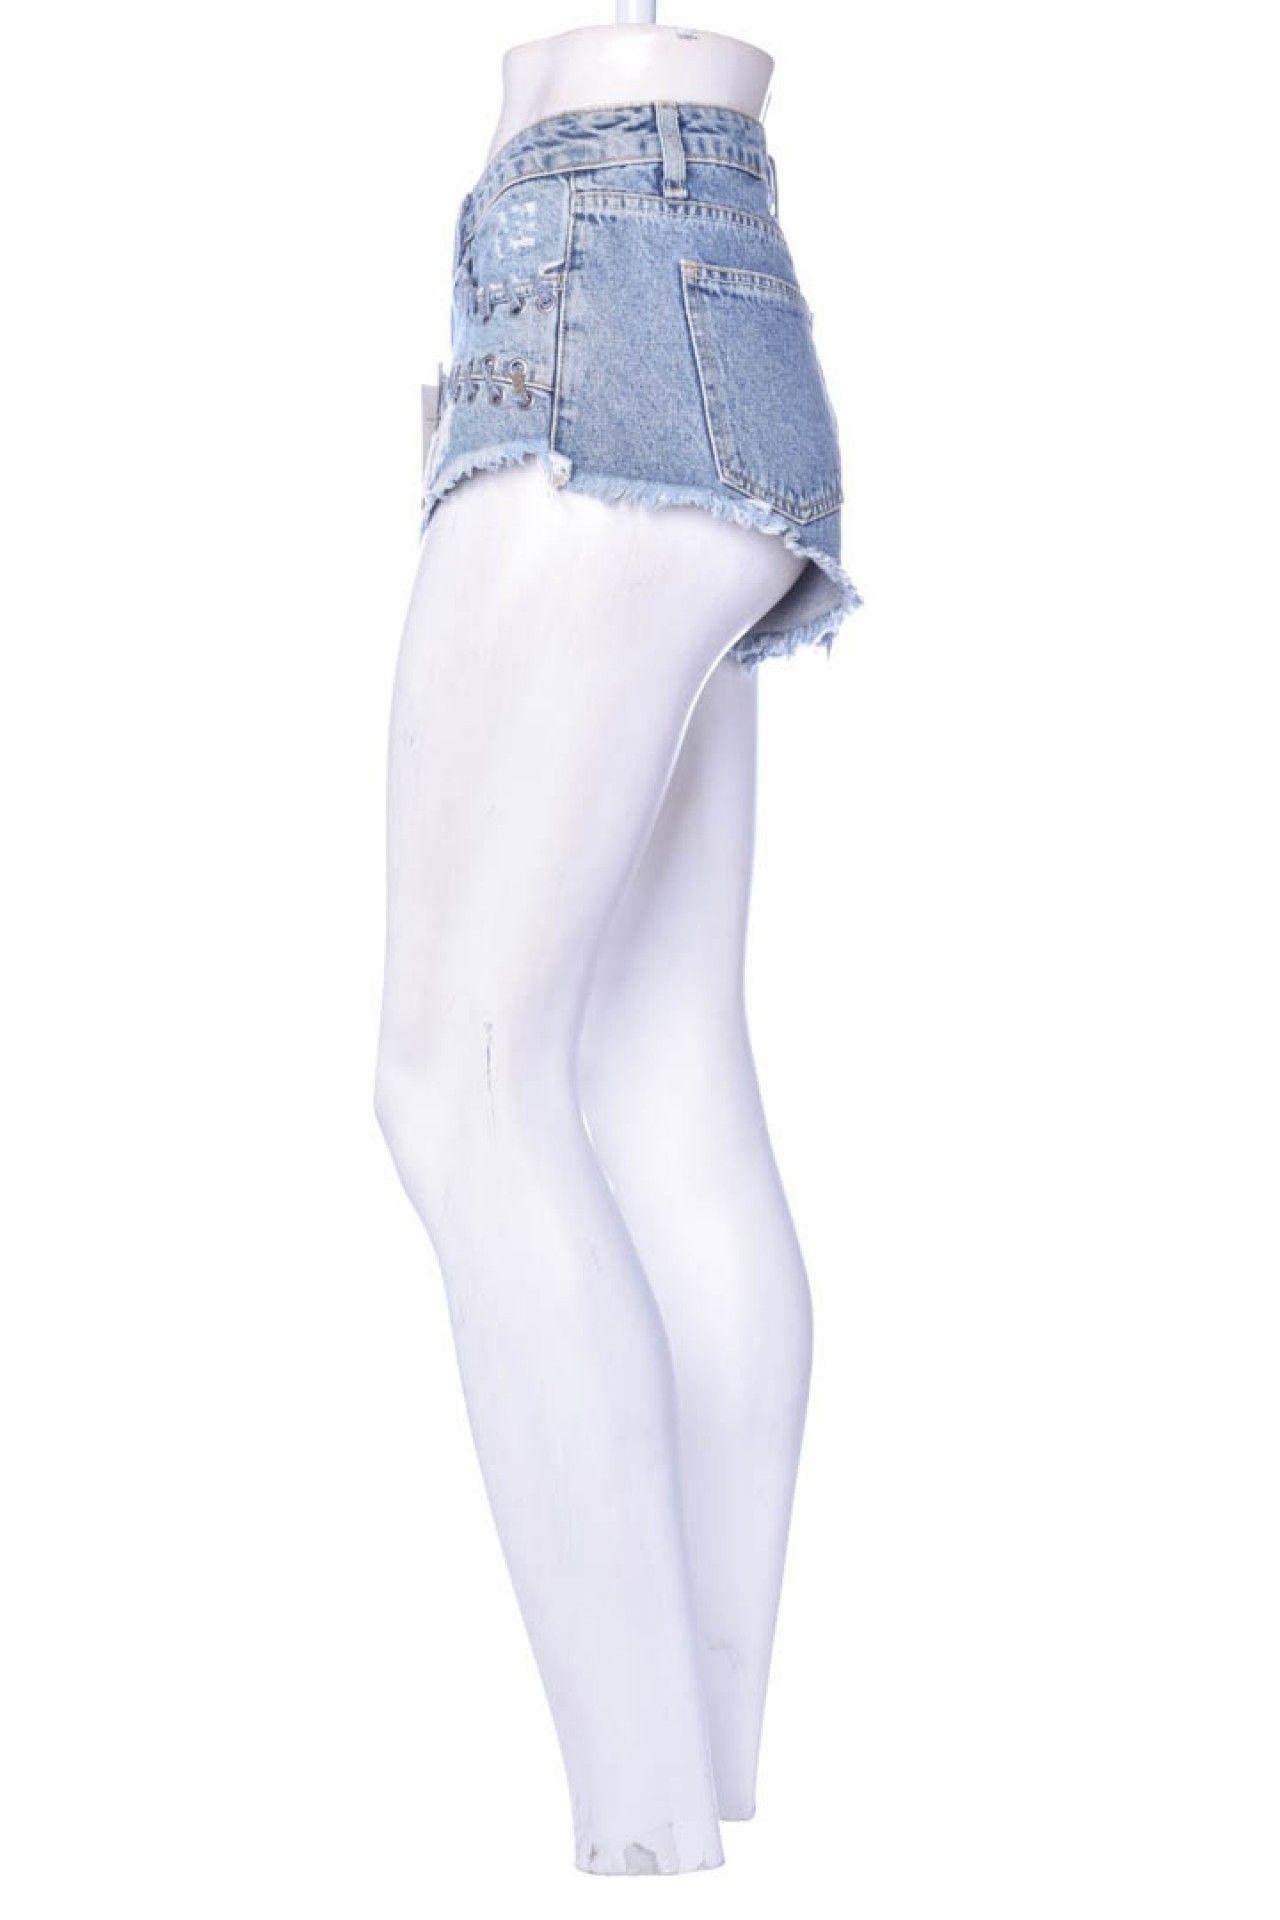 Espaço Fashion - Shorts Jeans Transpasse - Foto 2